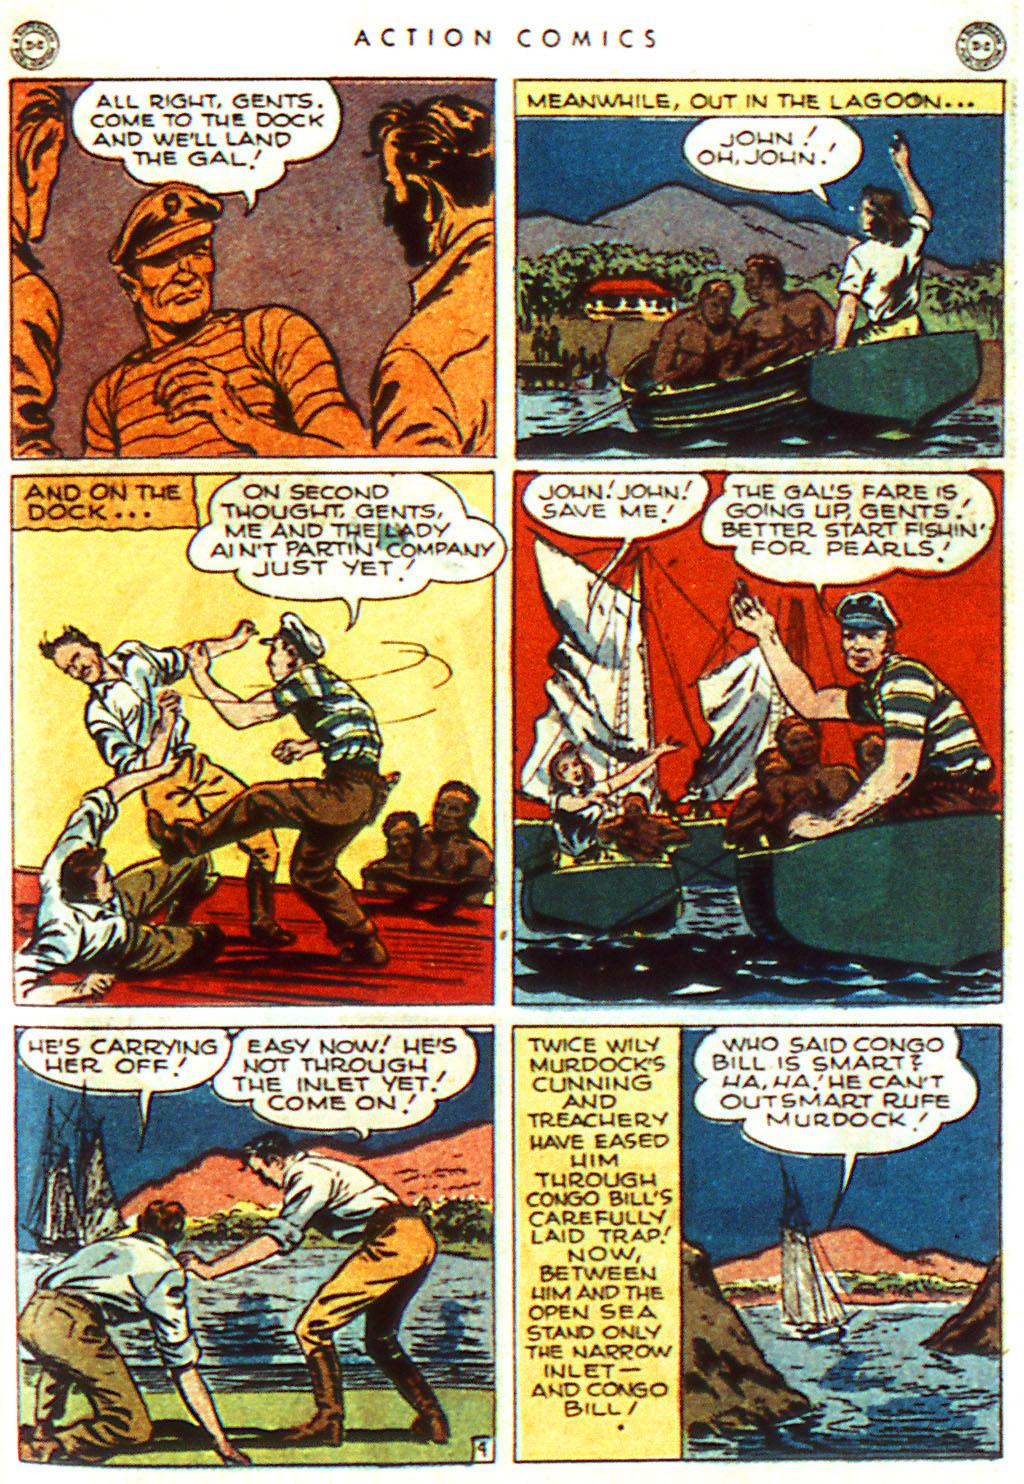 Action Comics (1938) 98 Page 32